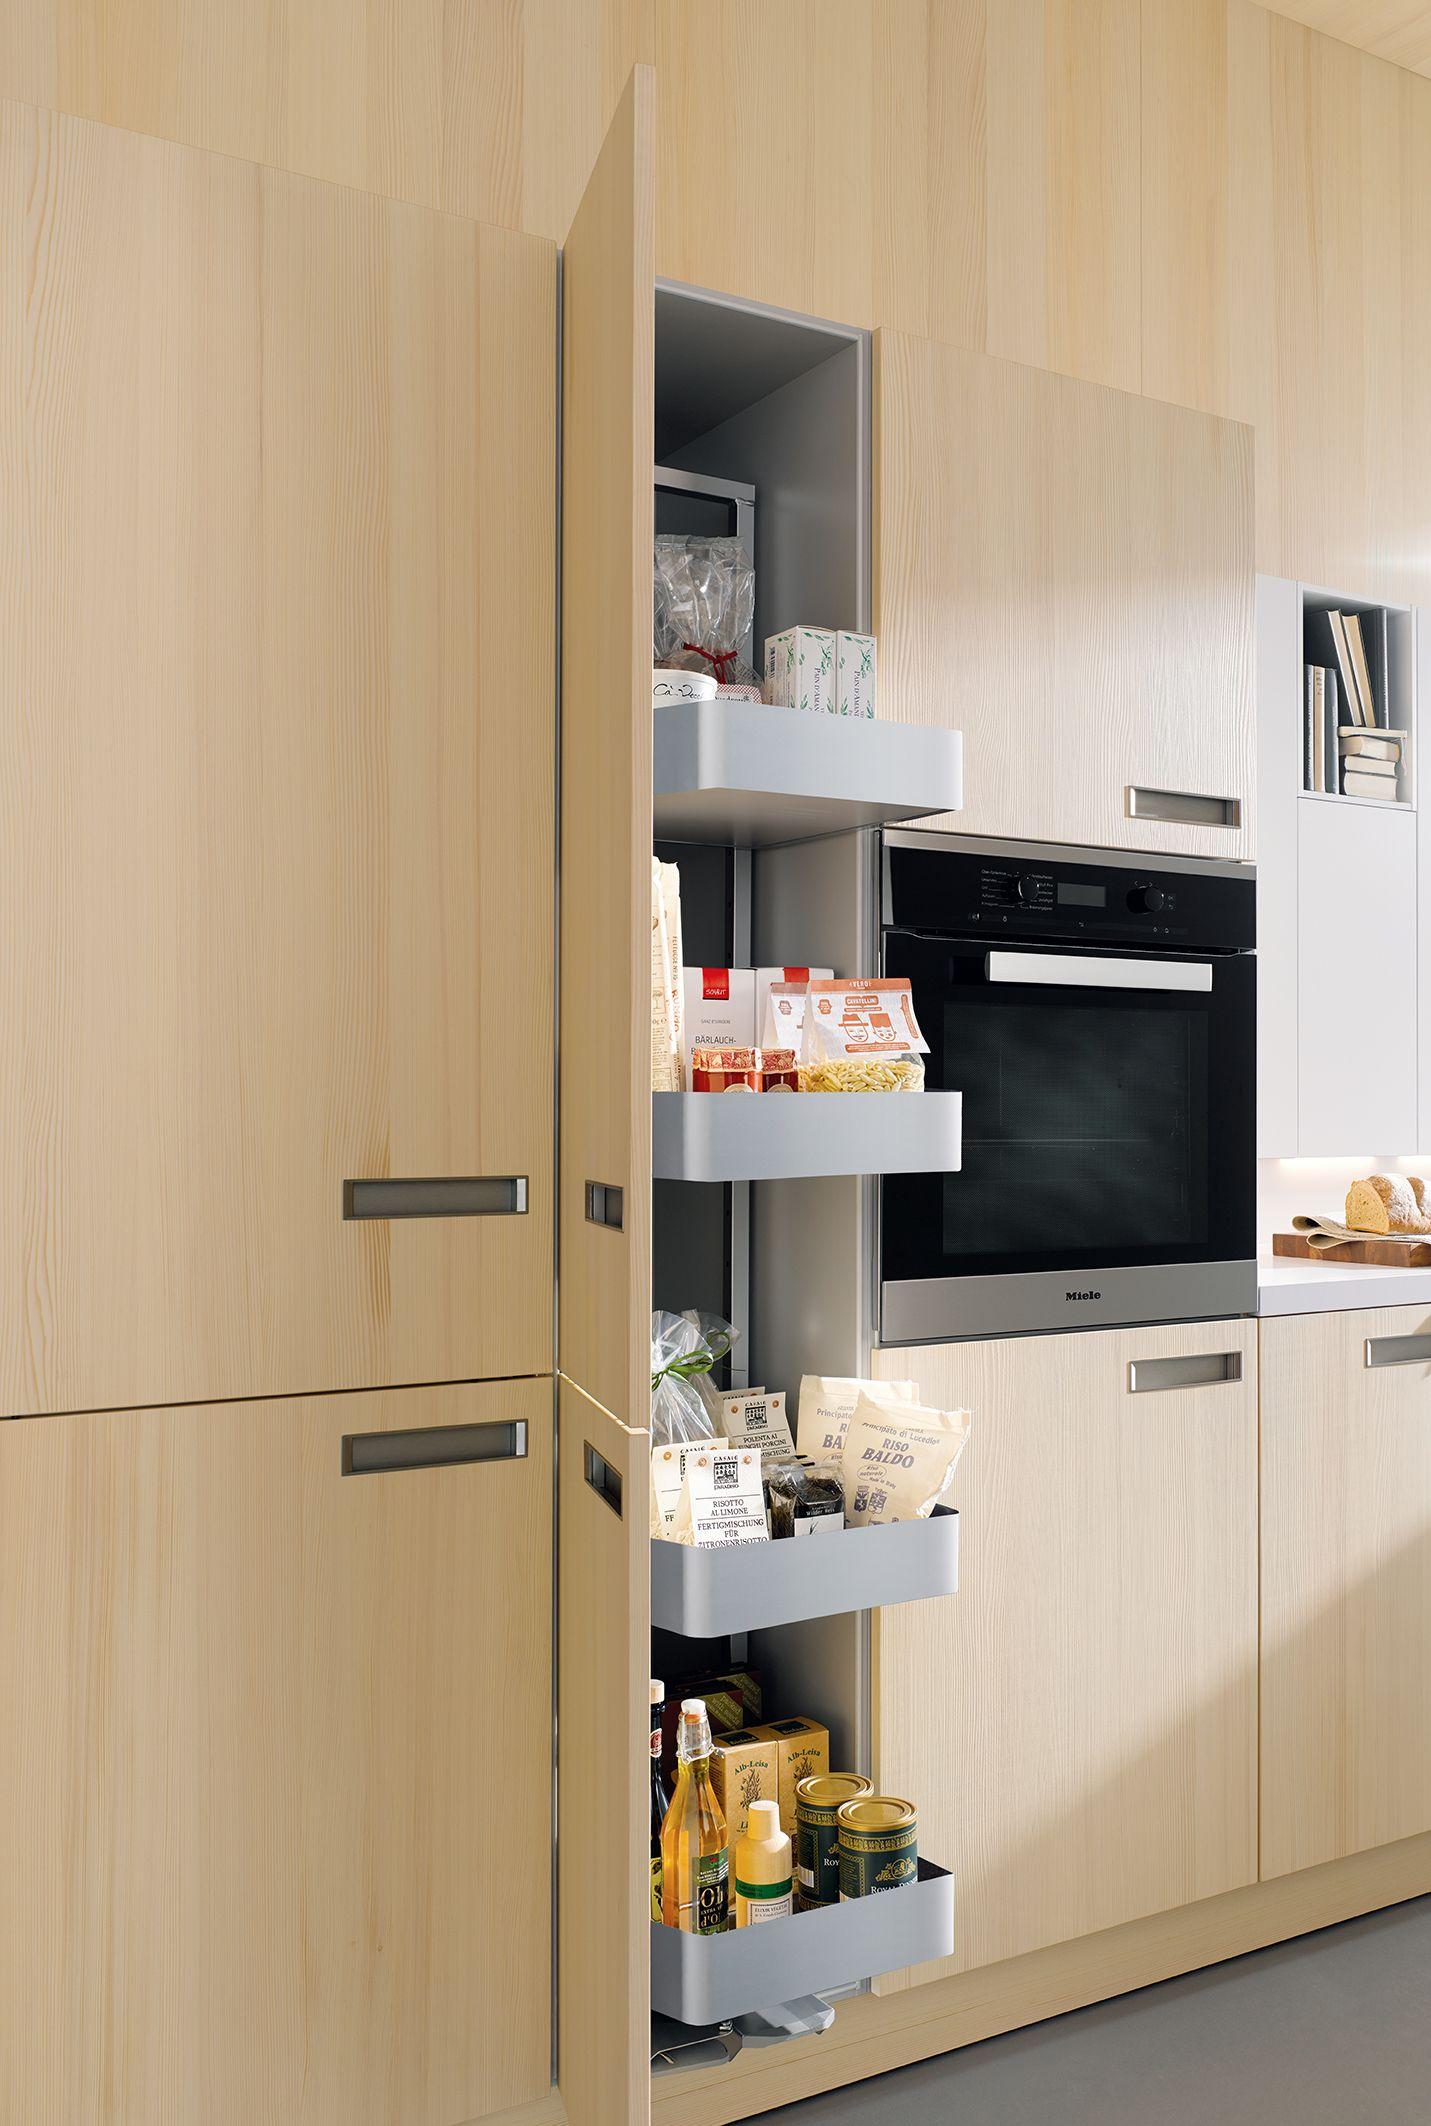 next125 kitchen pull out unit Kitchen, Kitchen pulls